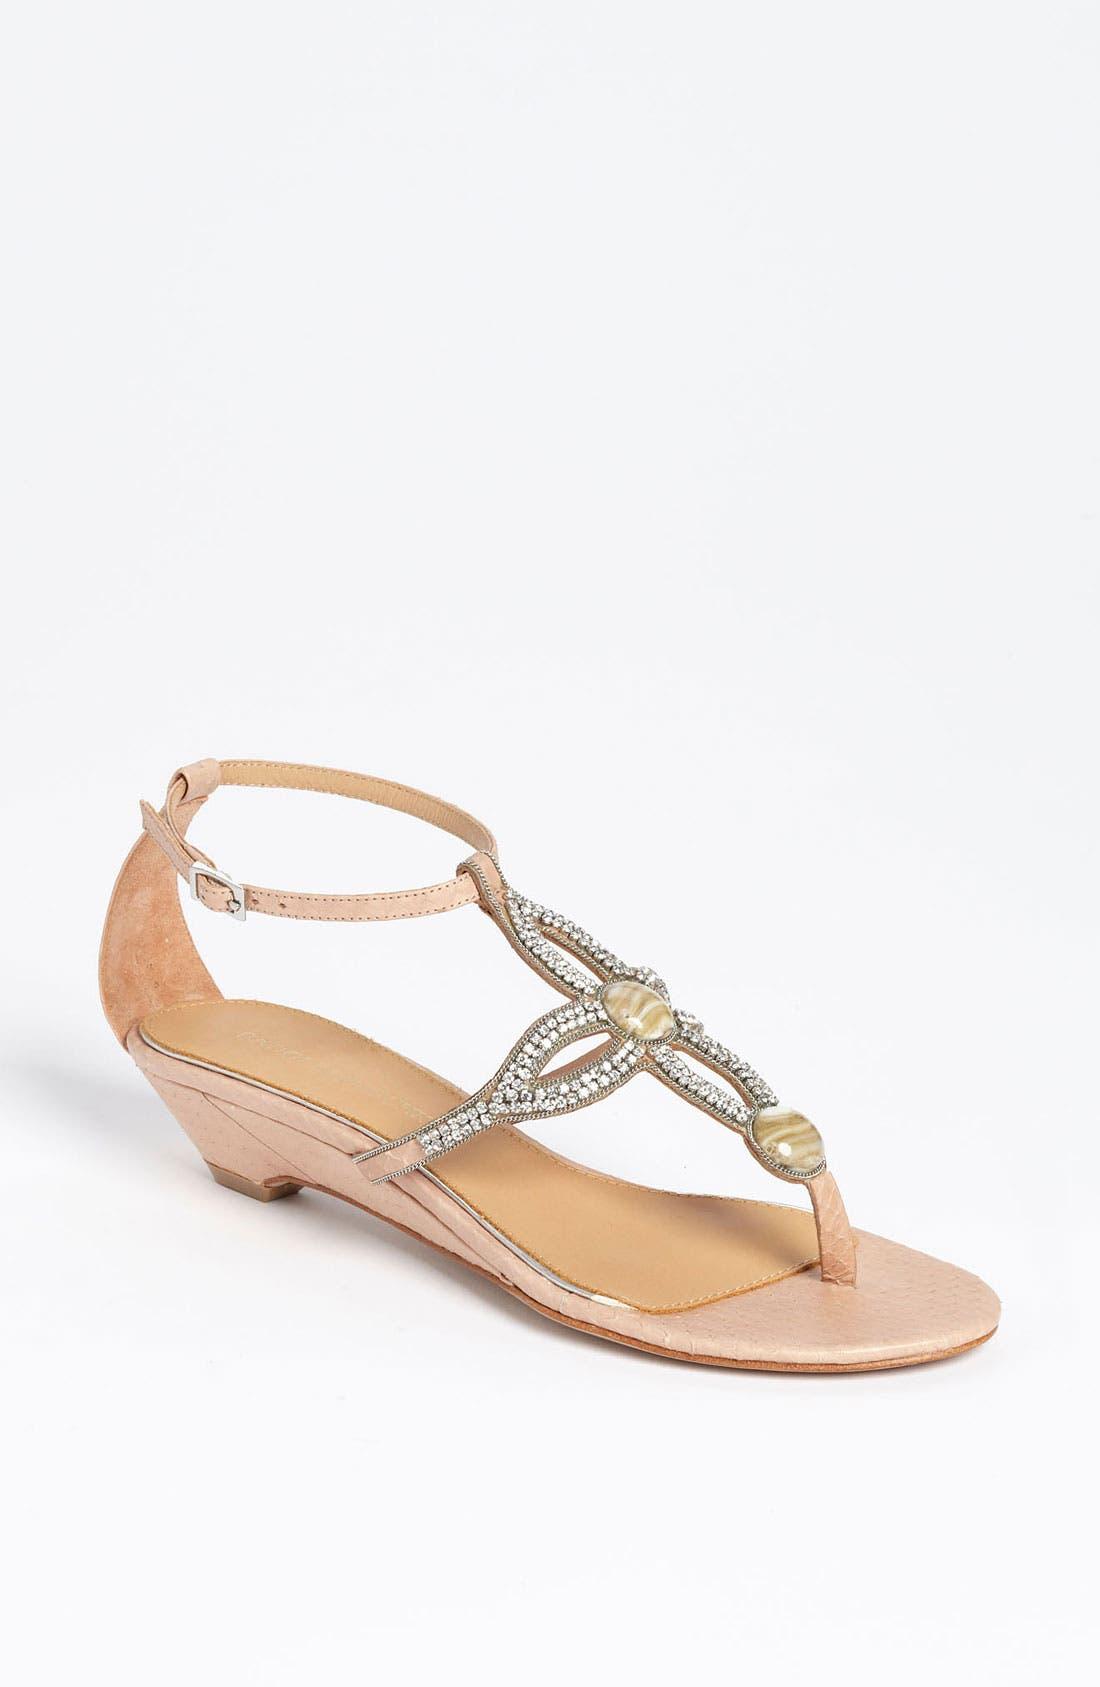 Main Image - Badgley Mischka 'Coye' Sandal